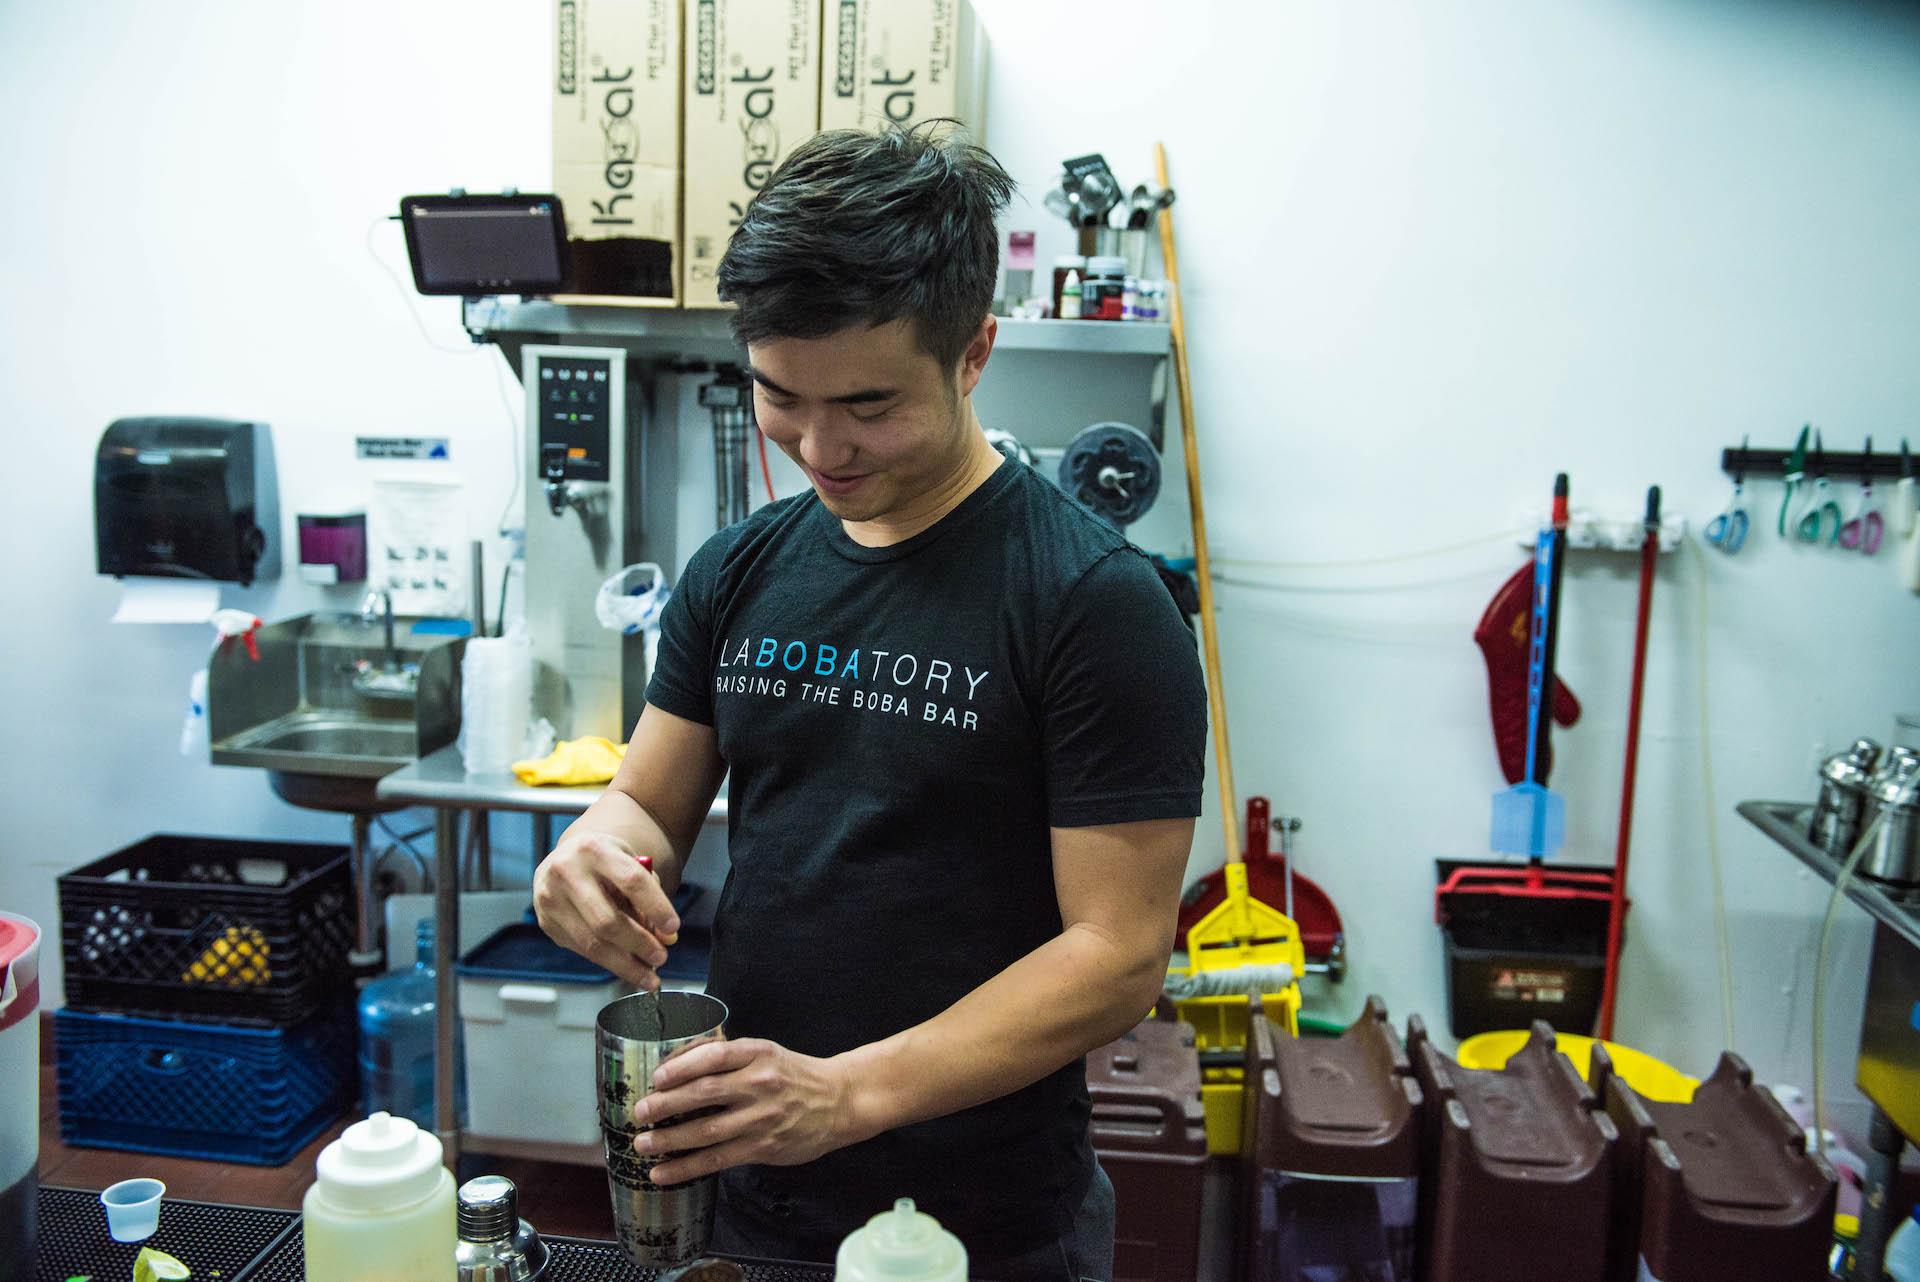 Keung prepares a #KittoKatto, a white chocolate matcha milk latte, in the Labobatory kitchen.